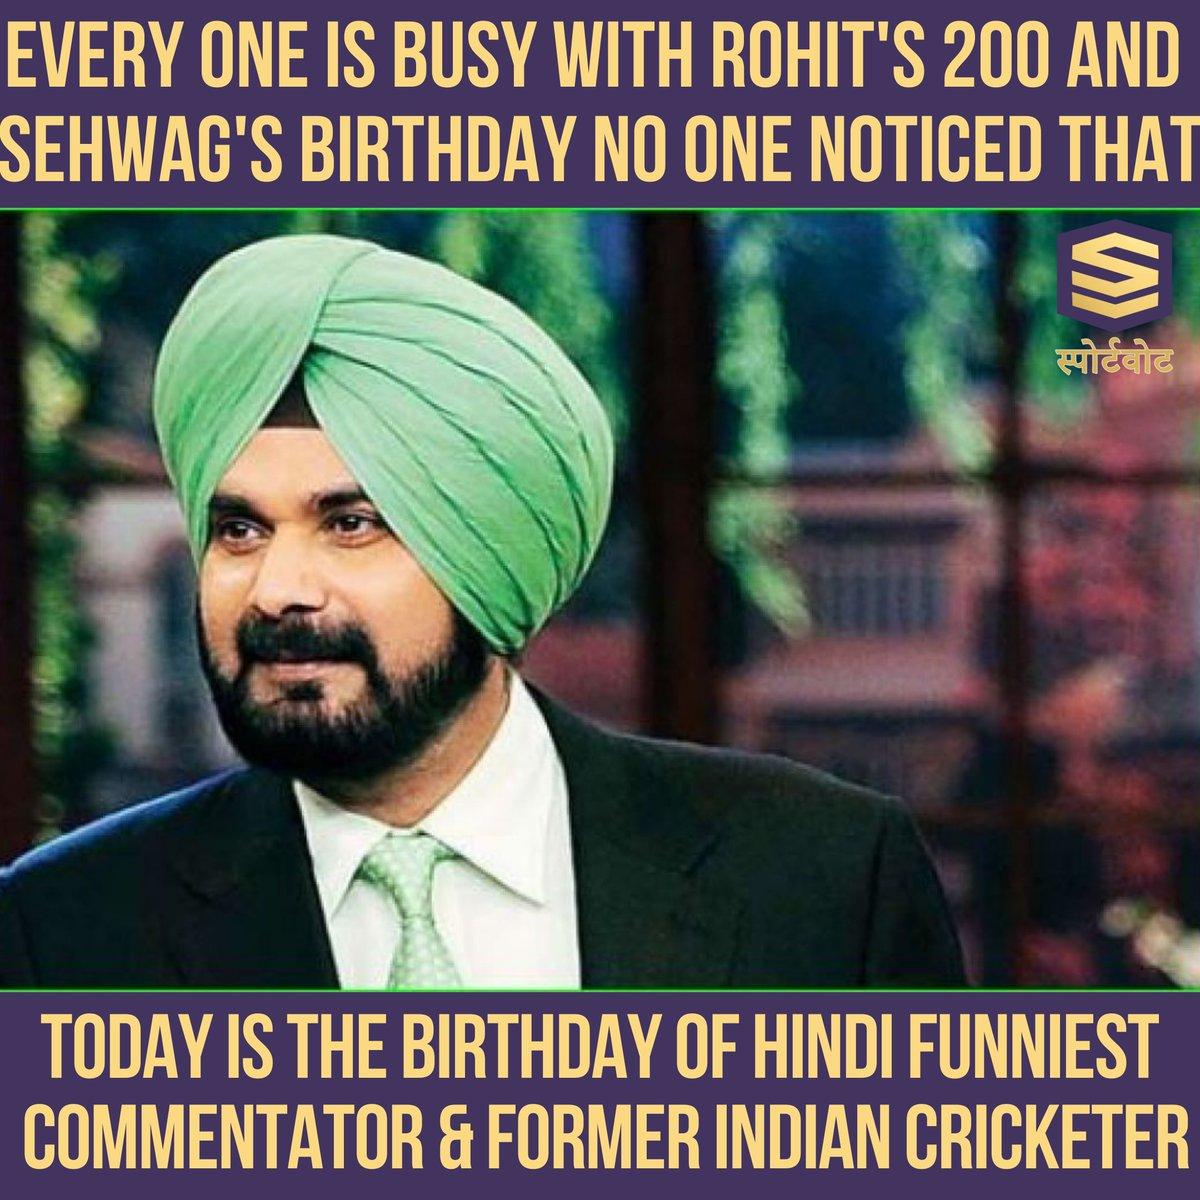 Happy Birthday @sherryontopp #navjotsinghsidhu #INDvSA #IndianArmy #virendersehwag #cricket #viratkohli #rohitsharma #sachintendulkar #yuvrajsingh #msdhoni #sachin #sportsjazba  #msd #sureshraina #indiancricket #zaheerkhan #england #teamindia #bleedblue